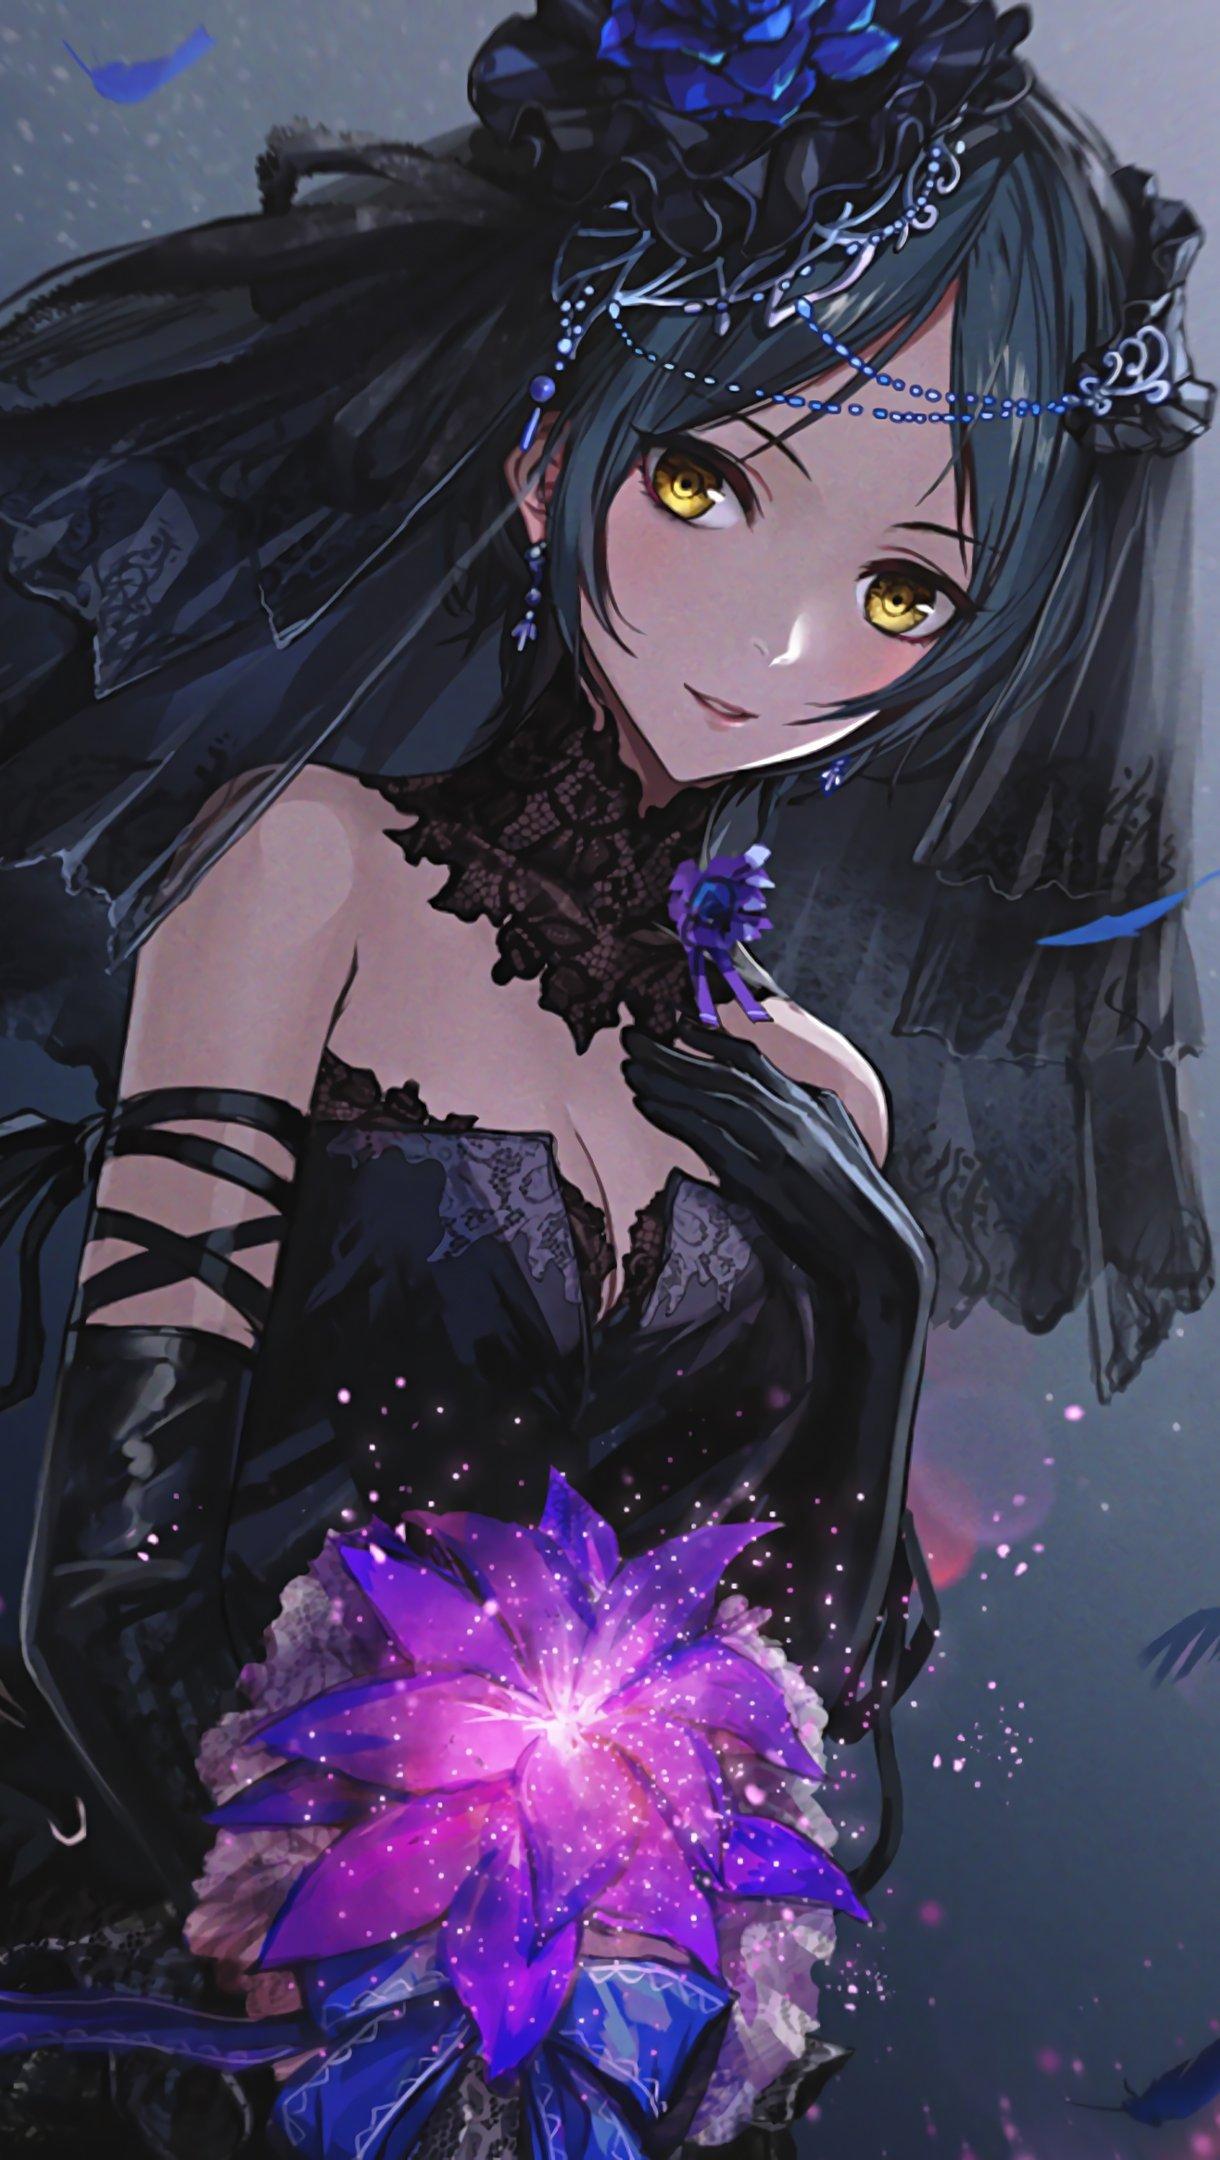 Wallpaper Anime girl with black dress Vertical